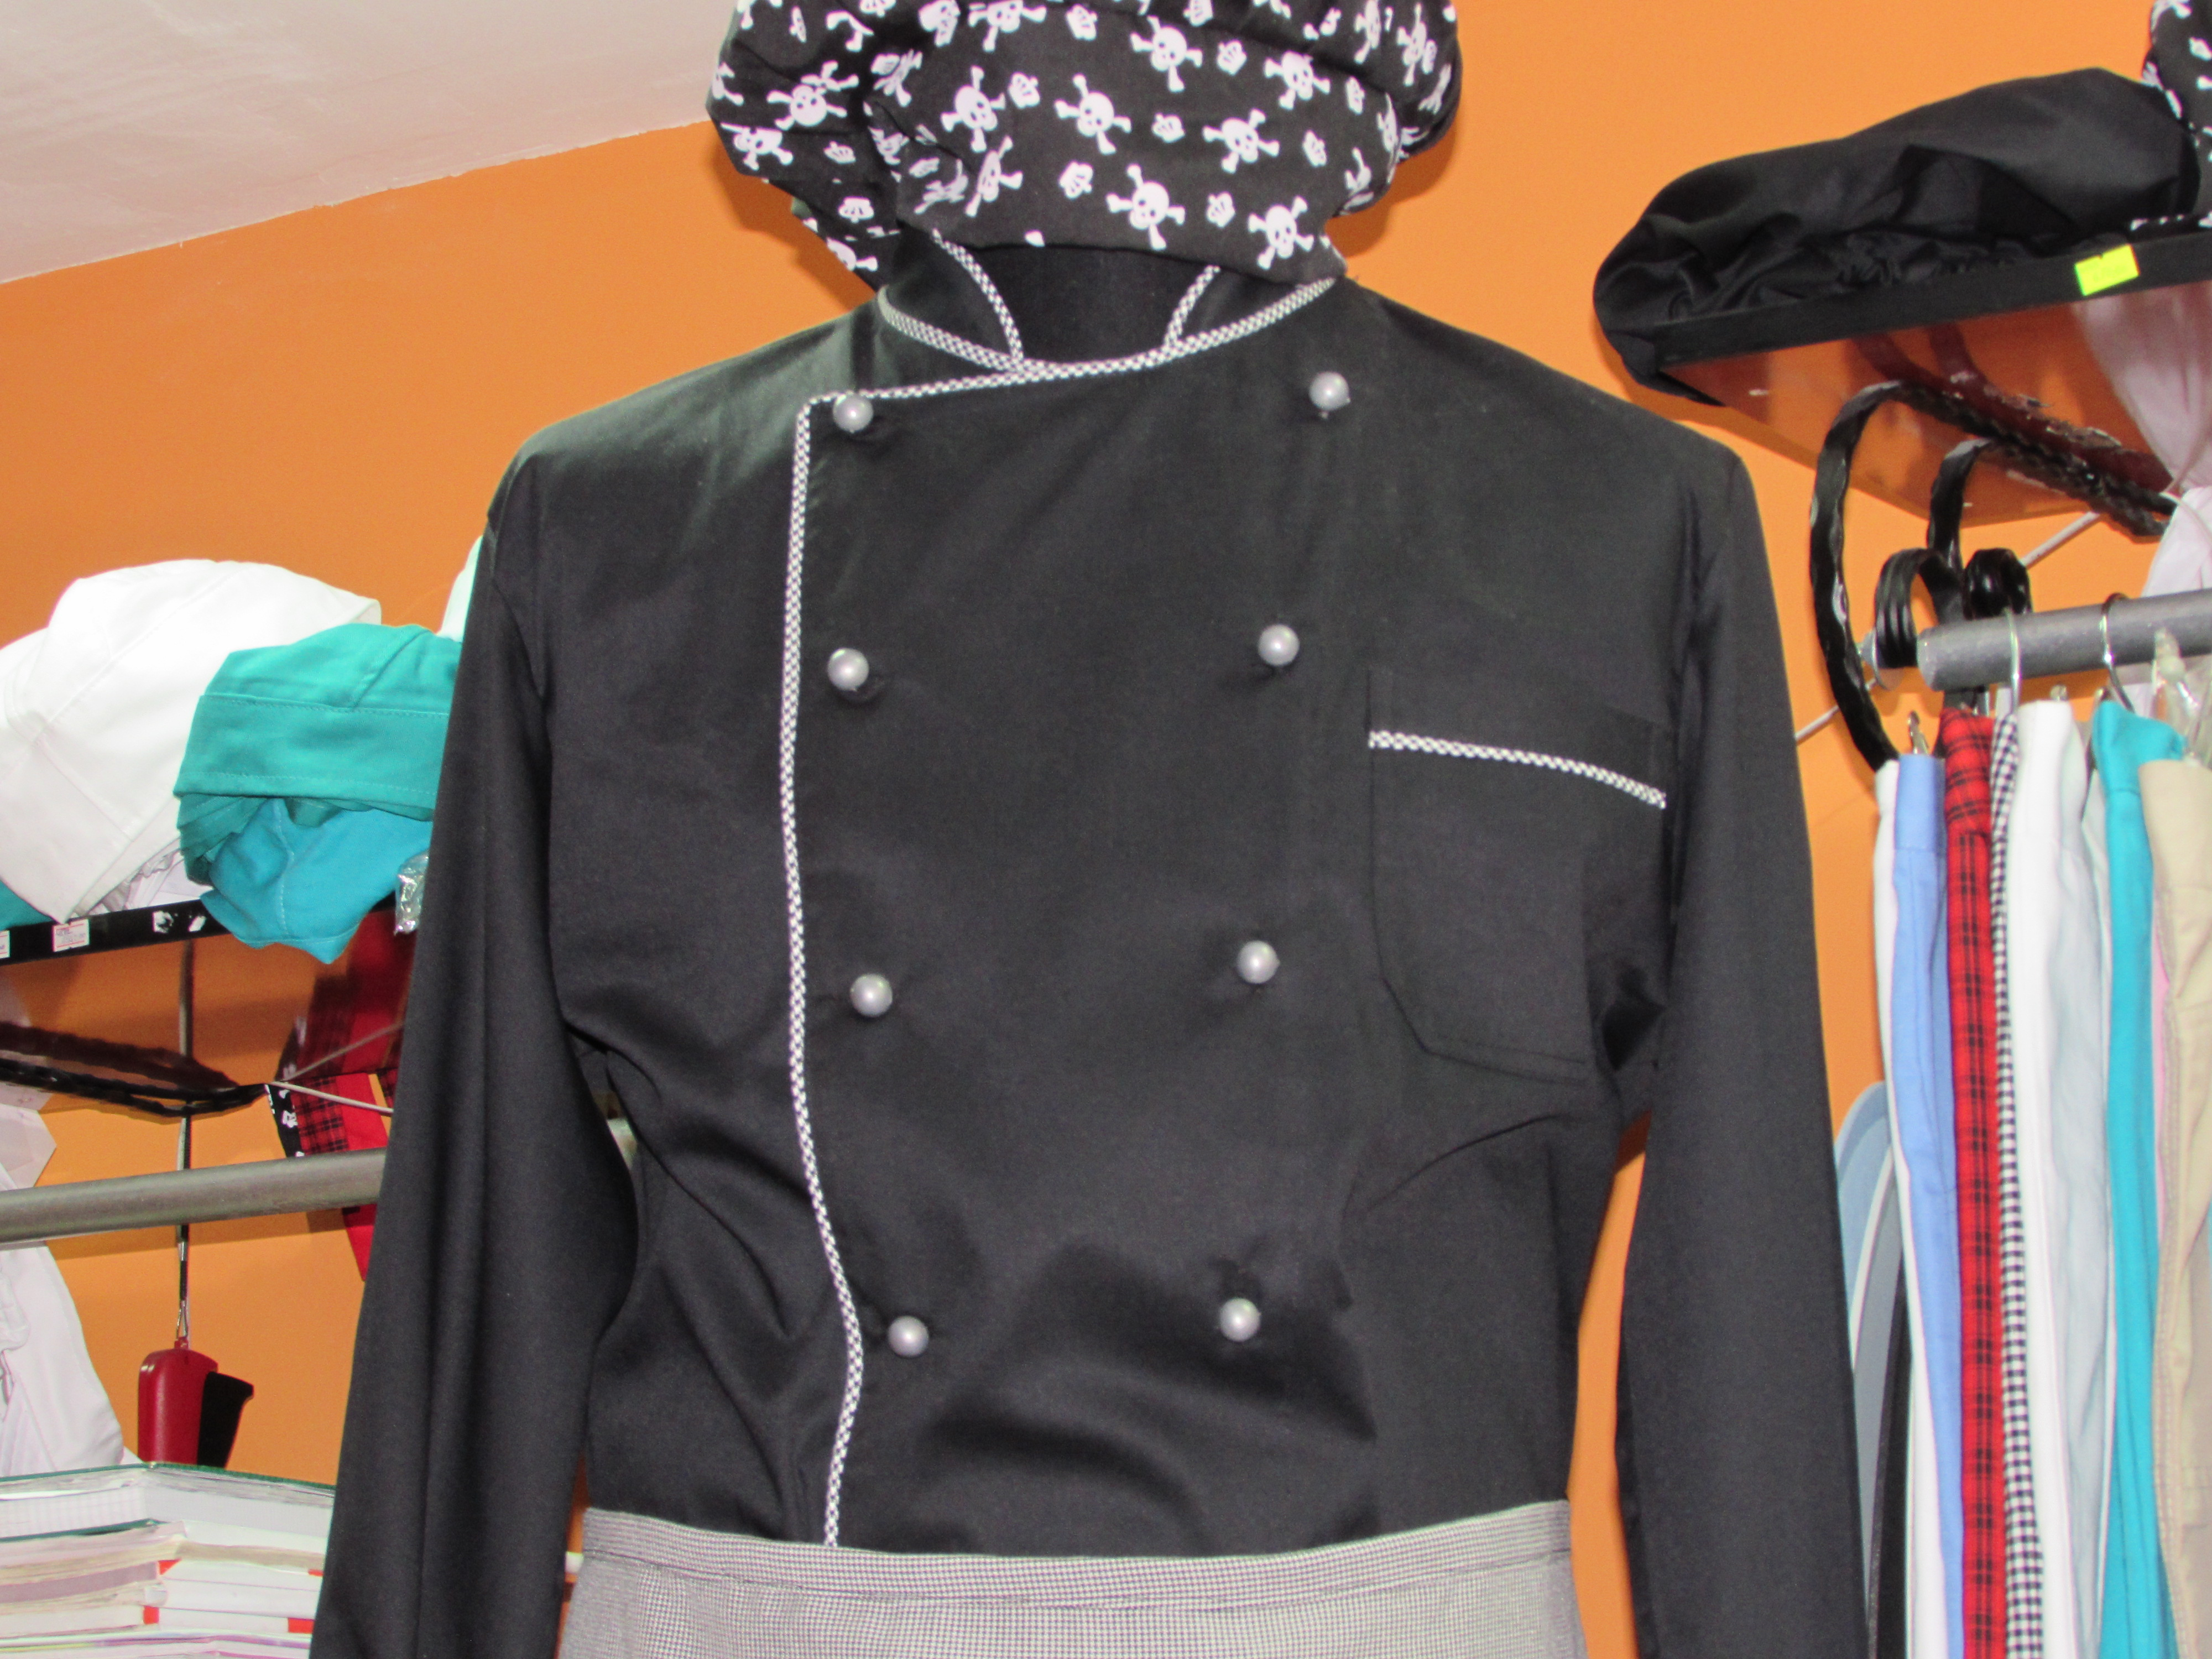 Crna kuvarska bluza-65% pes 35% viskoza